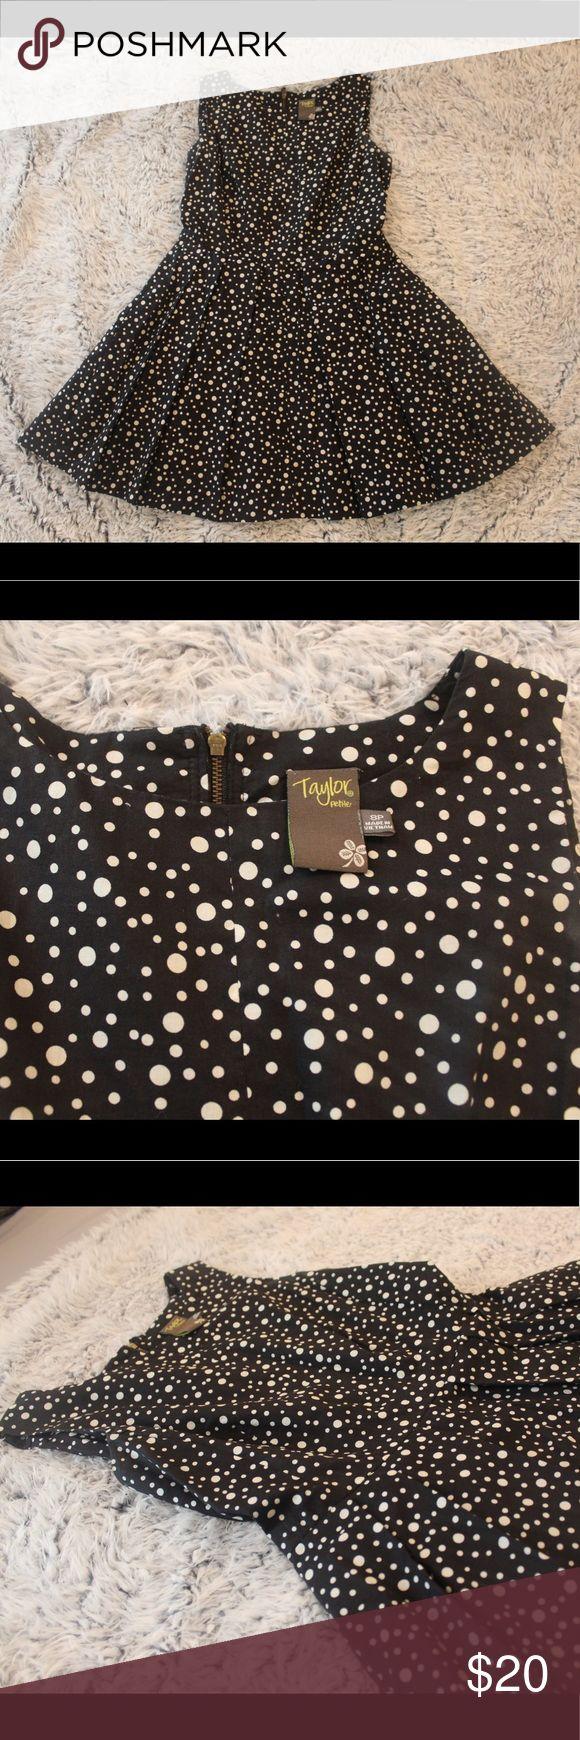 Taylor Petite Dress Polka dot dress, very good conditions looks new! Very nice fitting Dresses Midi